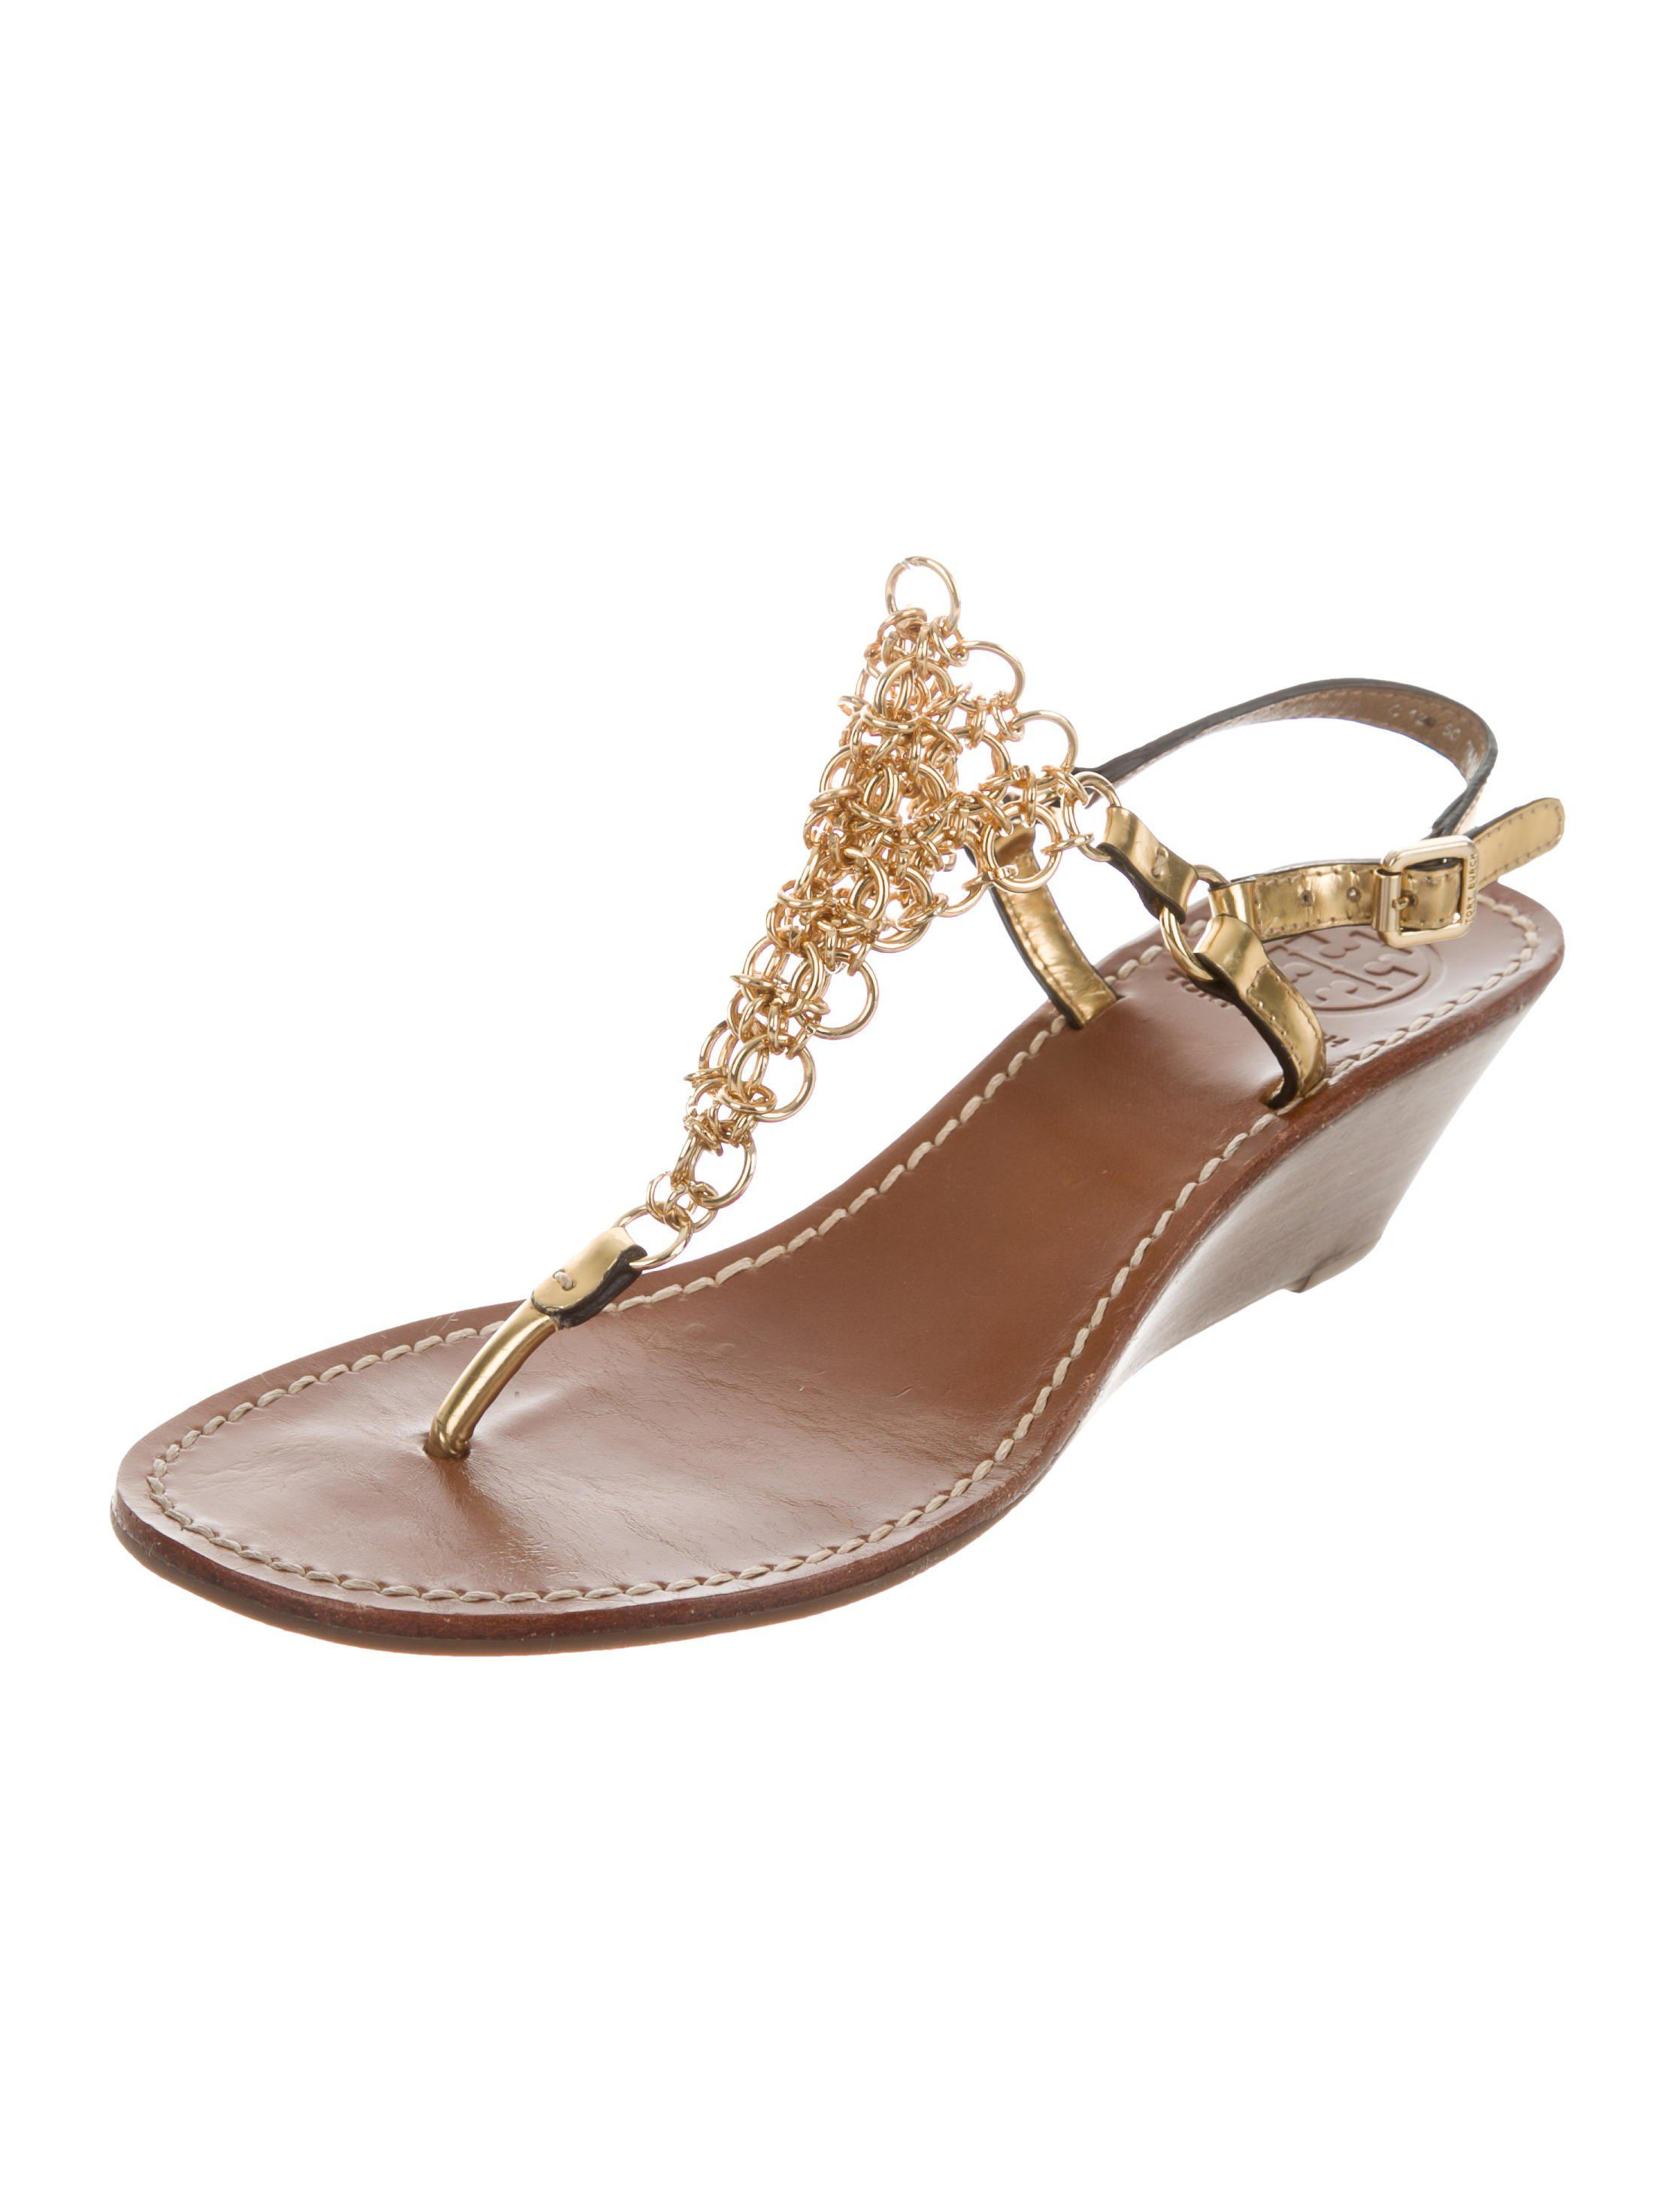 b8c3855298c8a Tory Burch - Metallic Chain-link Wedge Sandals - Lyst. View fullscreen